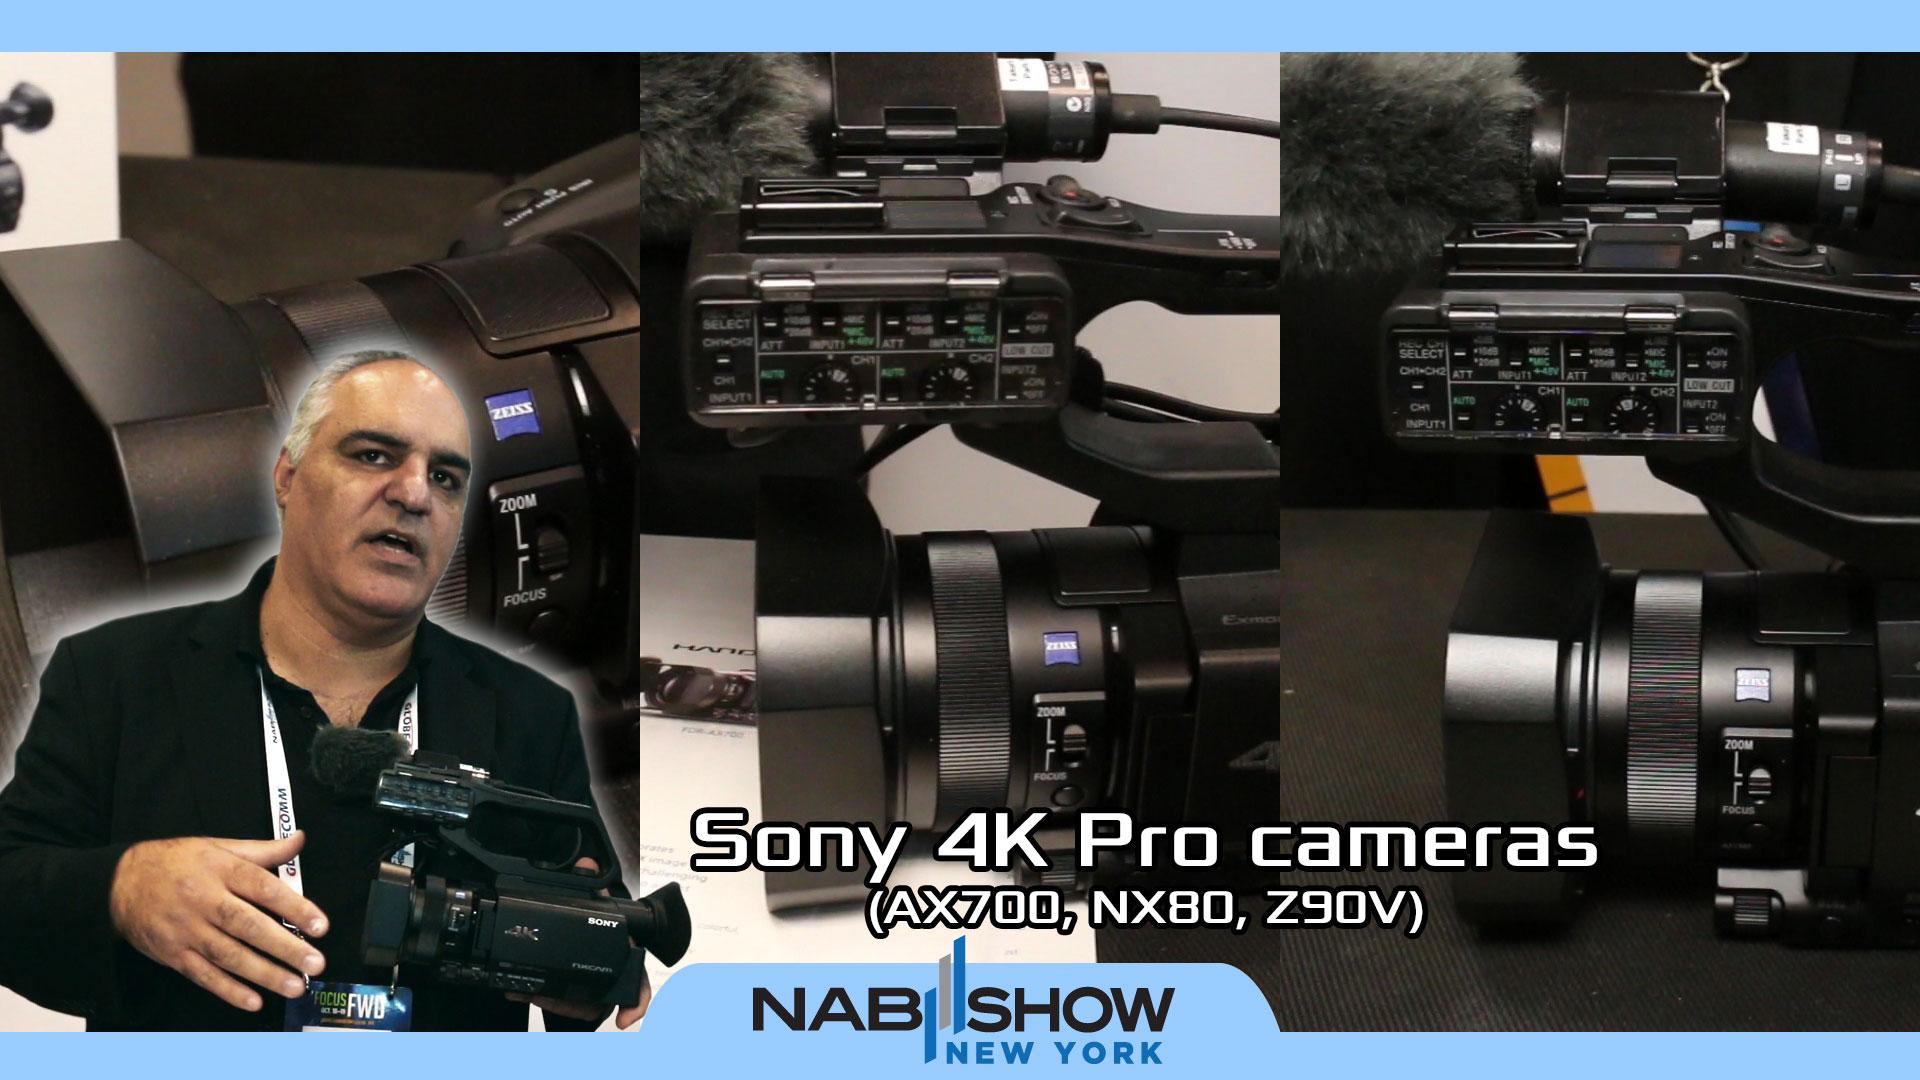 Sony 4K Camcorders